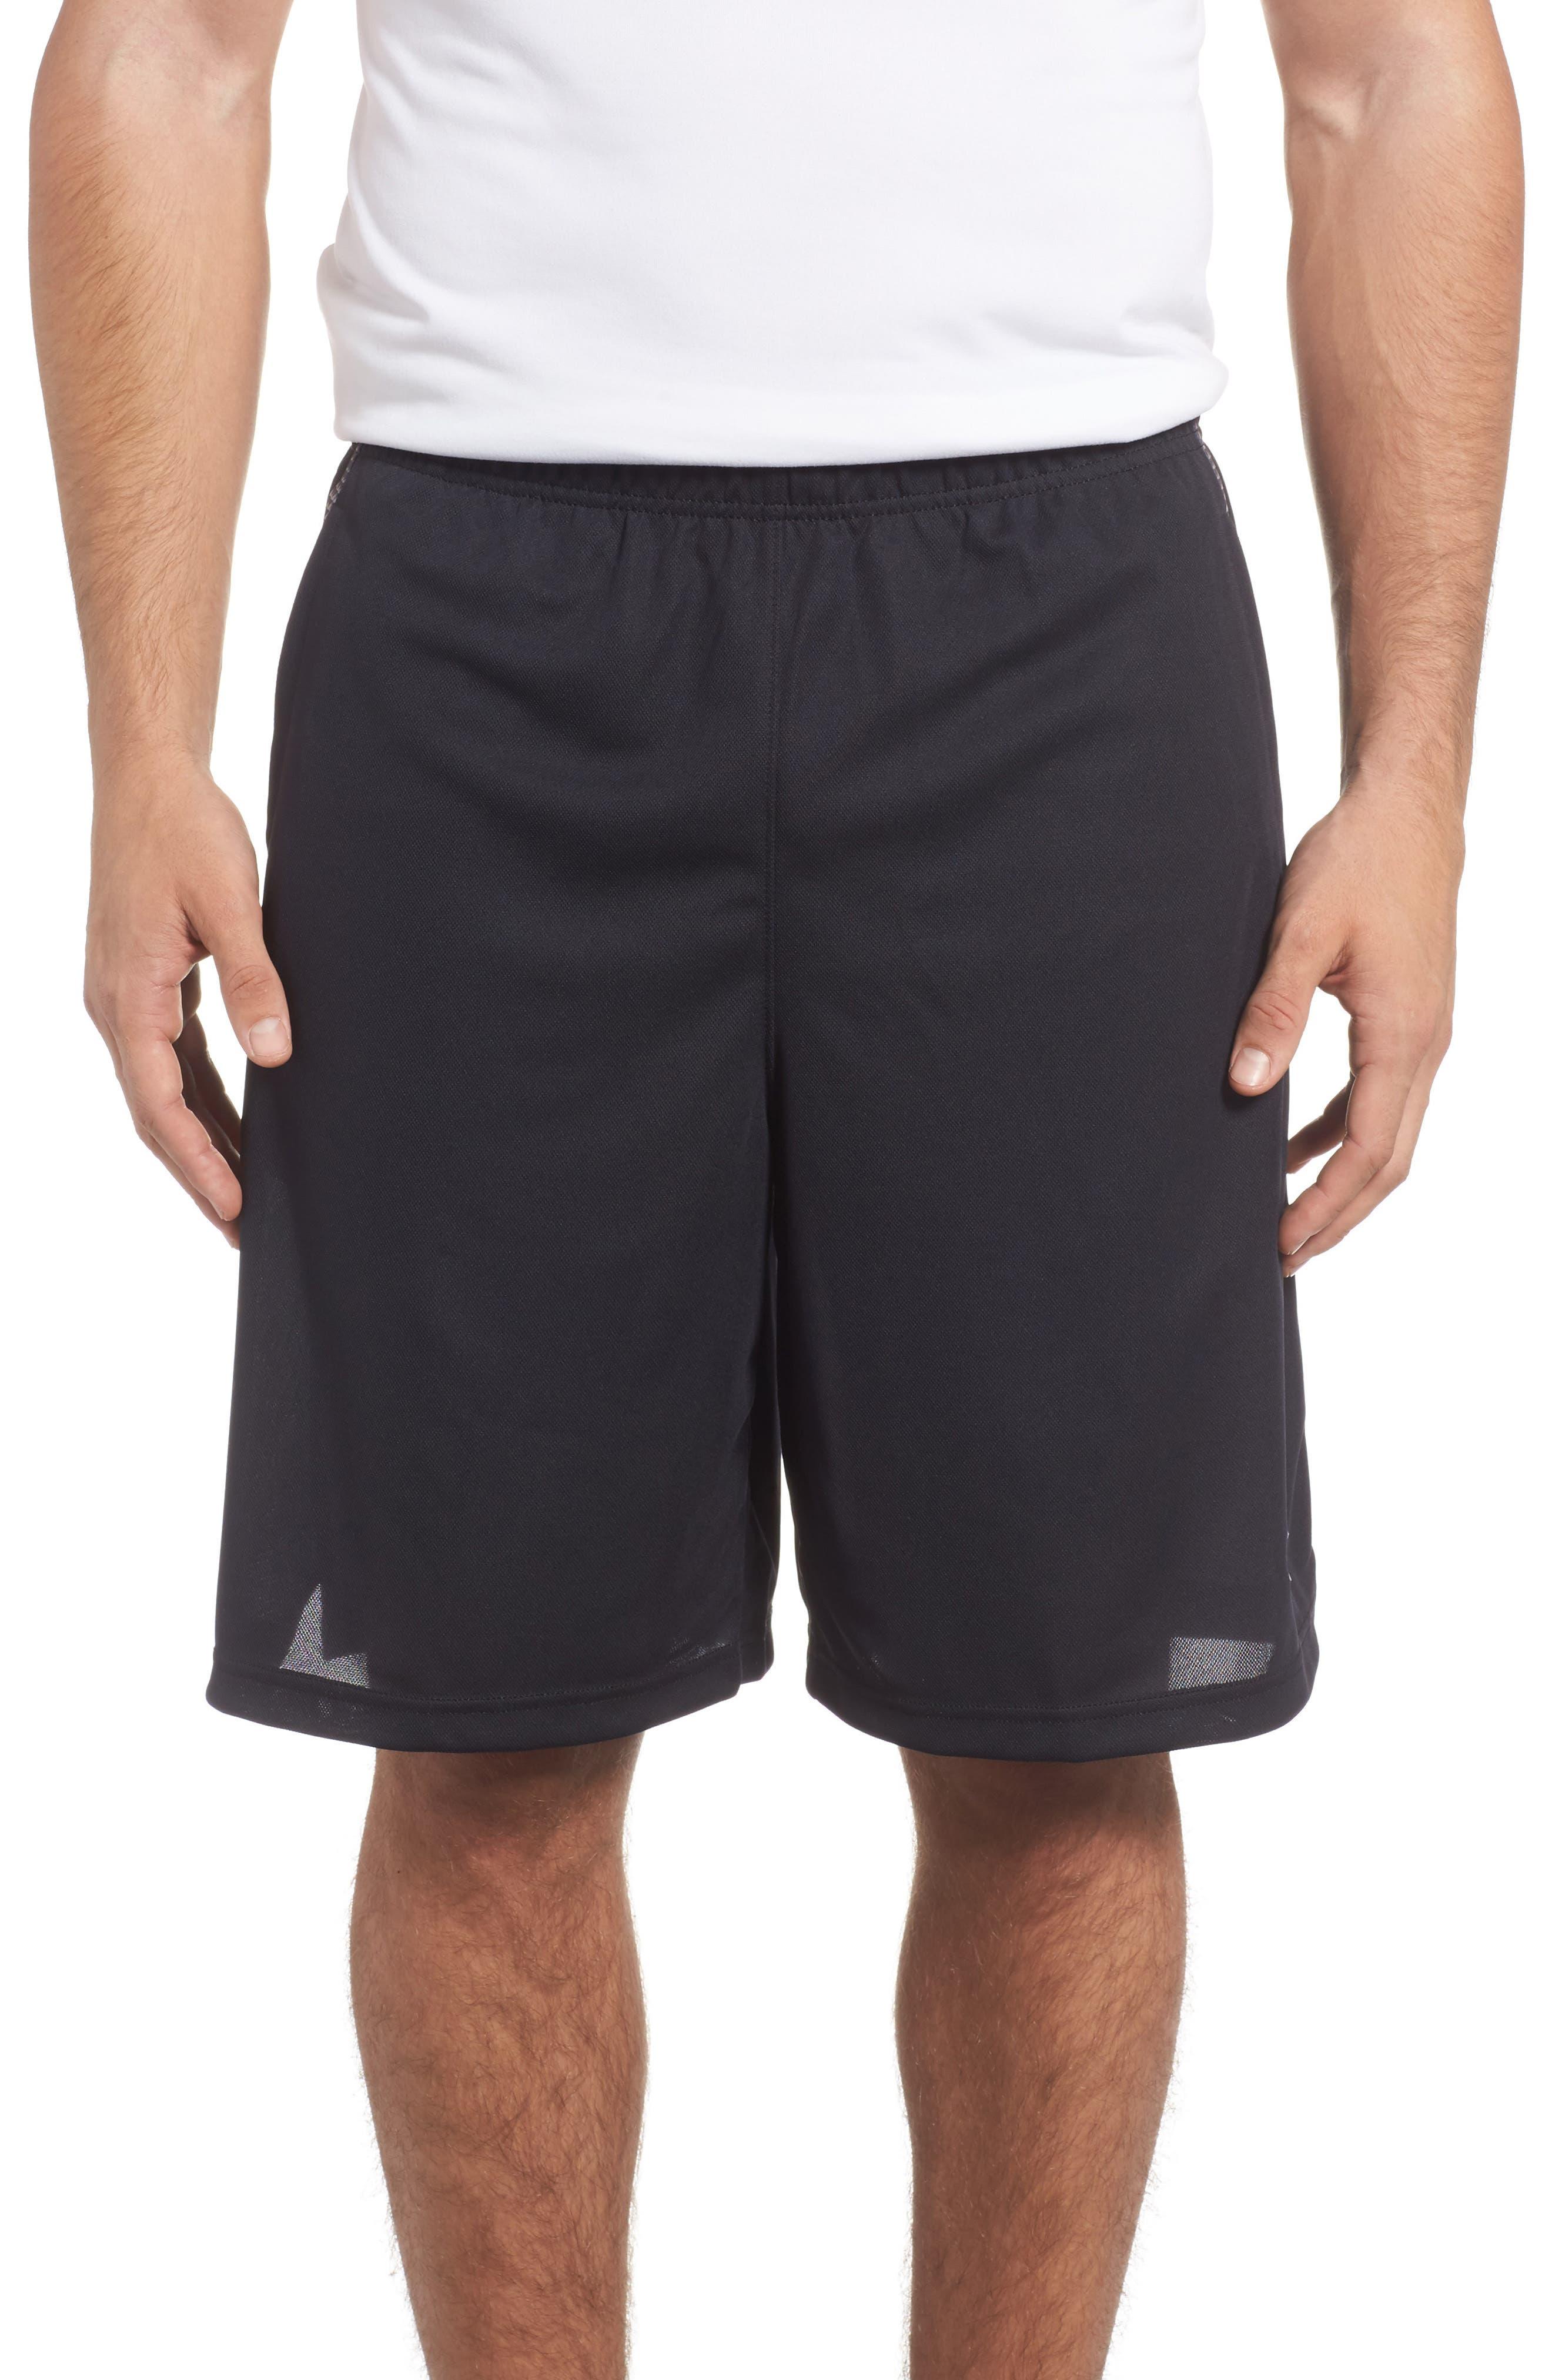 Main Image - Under Armour Select Basketball Shorts